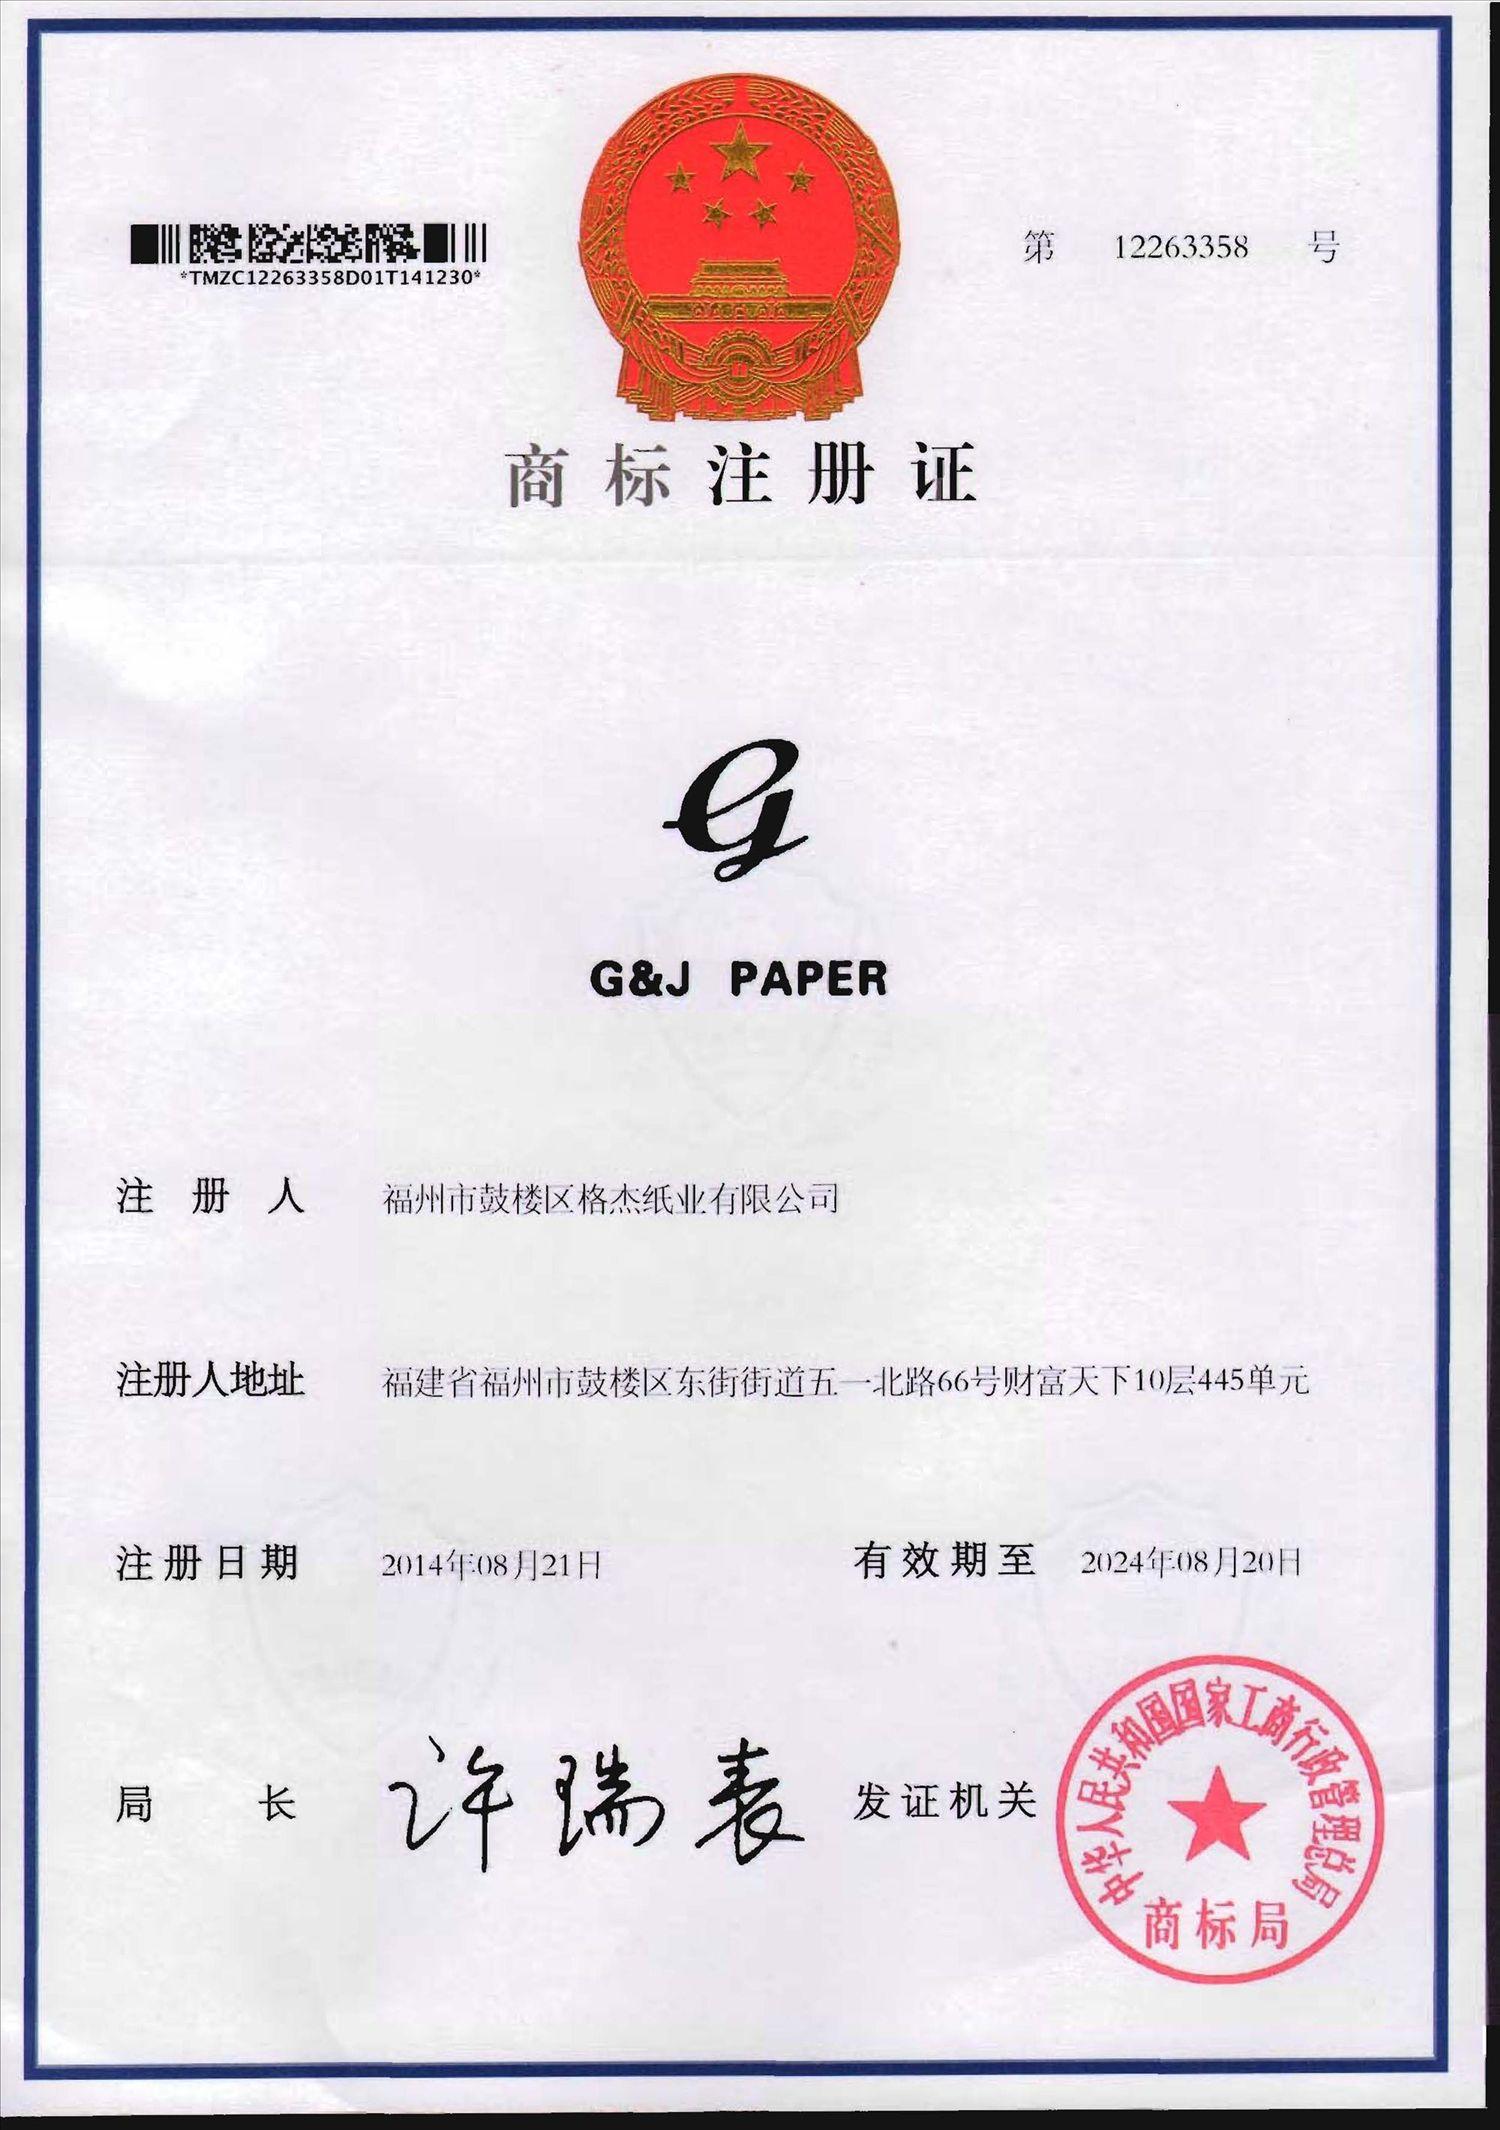 G&J PAPER